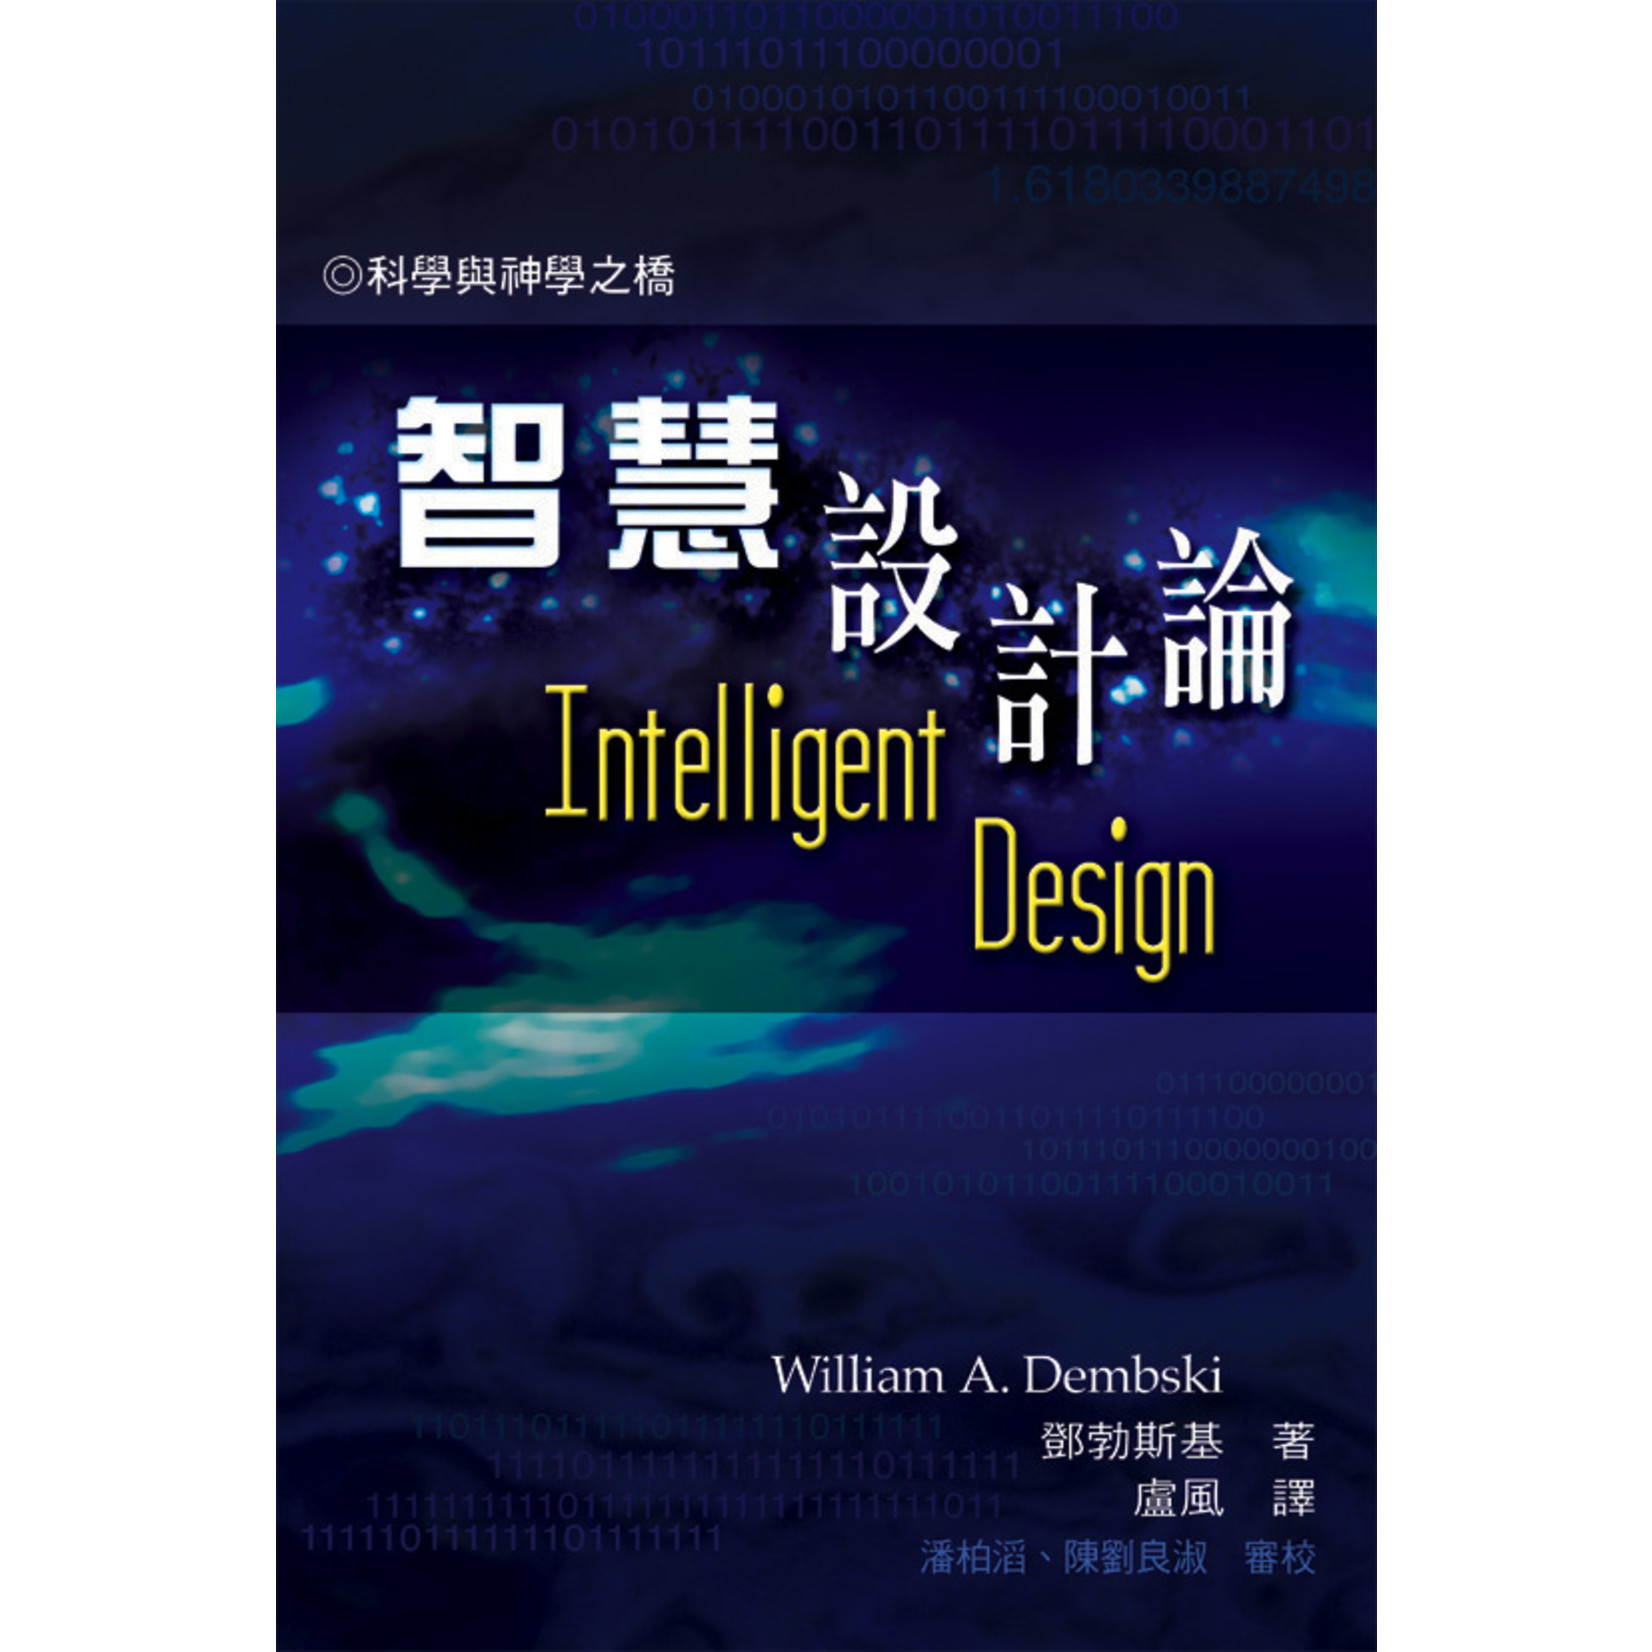 天道書樓 Tien Dao Publishing House 智慧設計論:科學與神學之橋 Intelligent Design